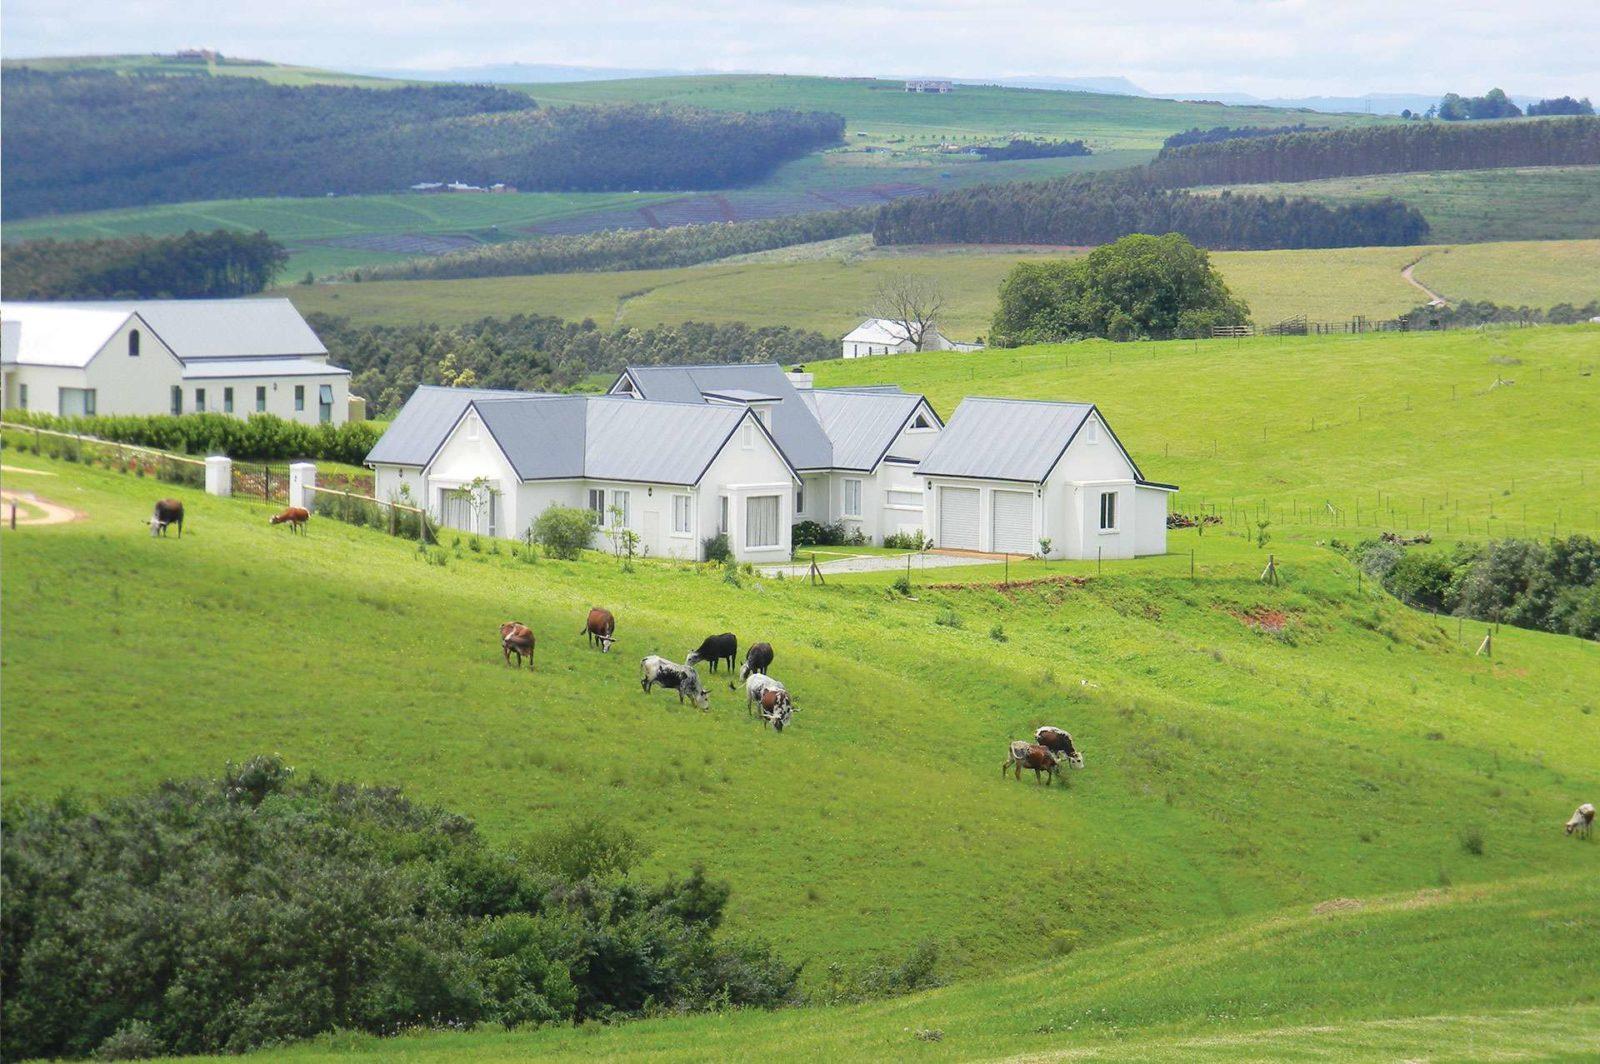 Nguni cattle roaming the Estate